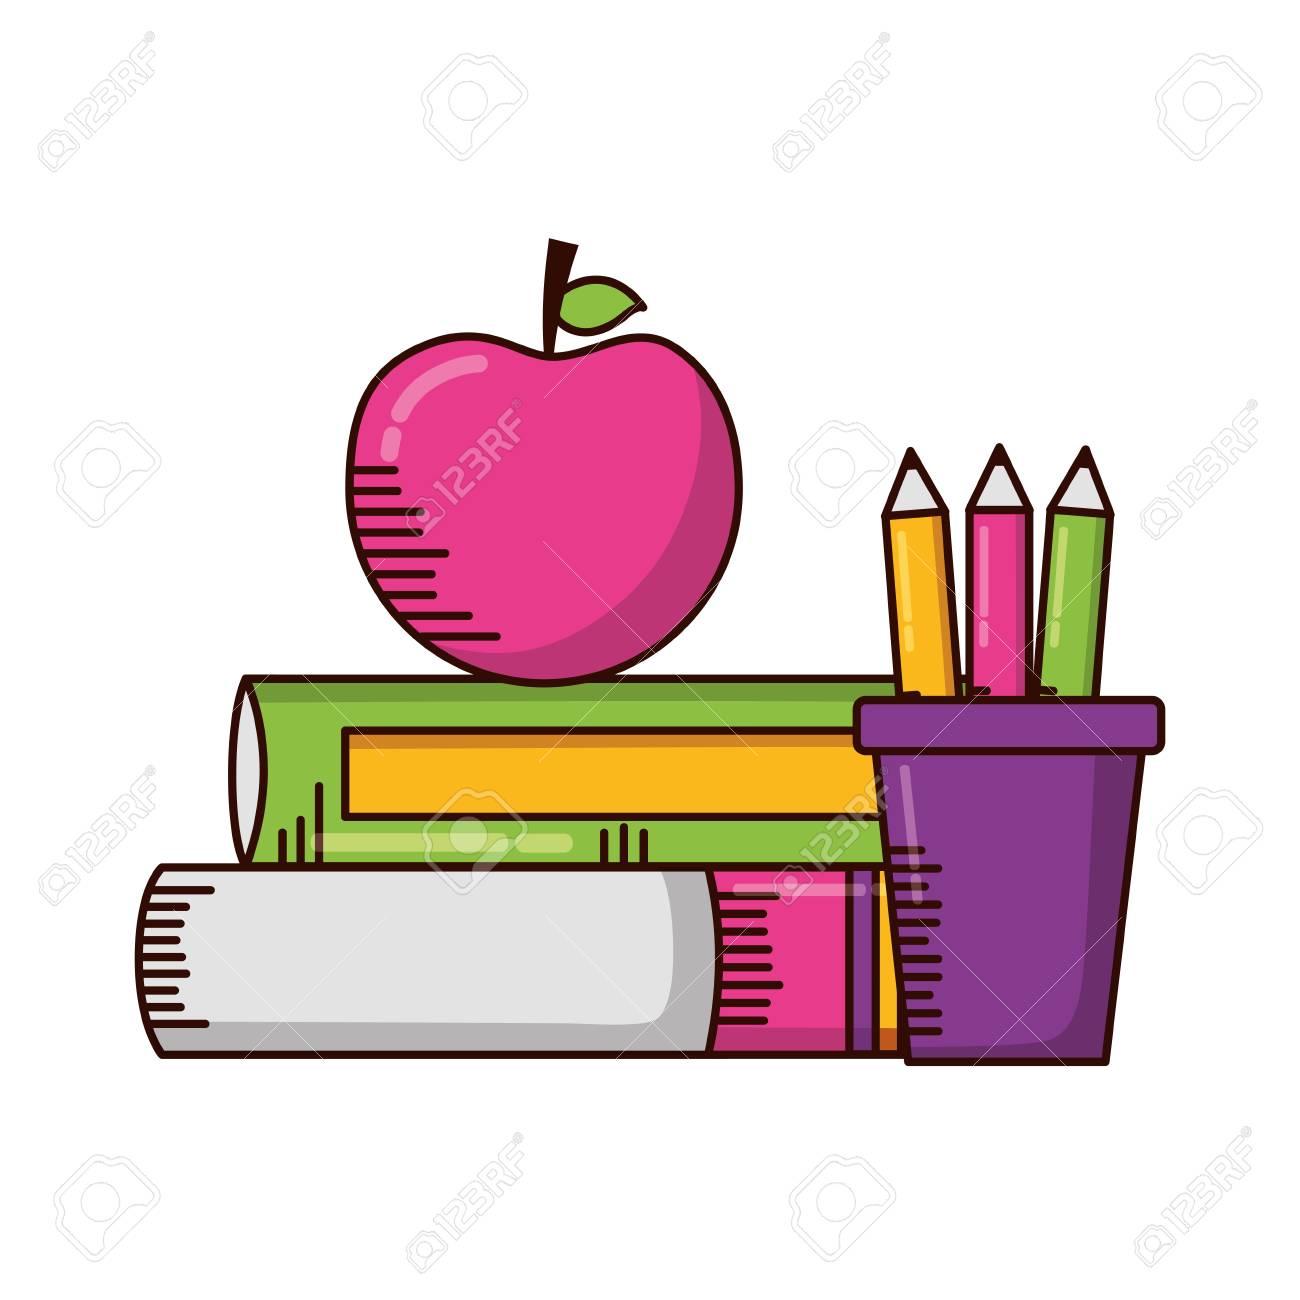 books apple pencils school supplies vector illustration design - 121789449